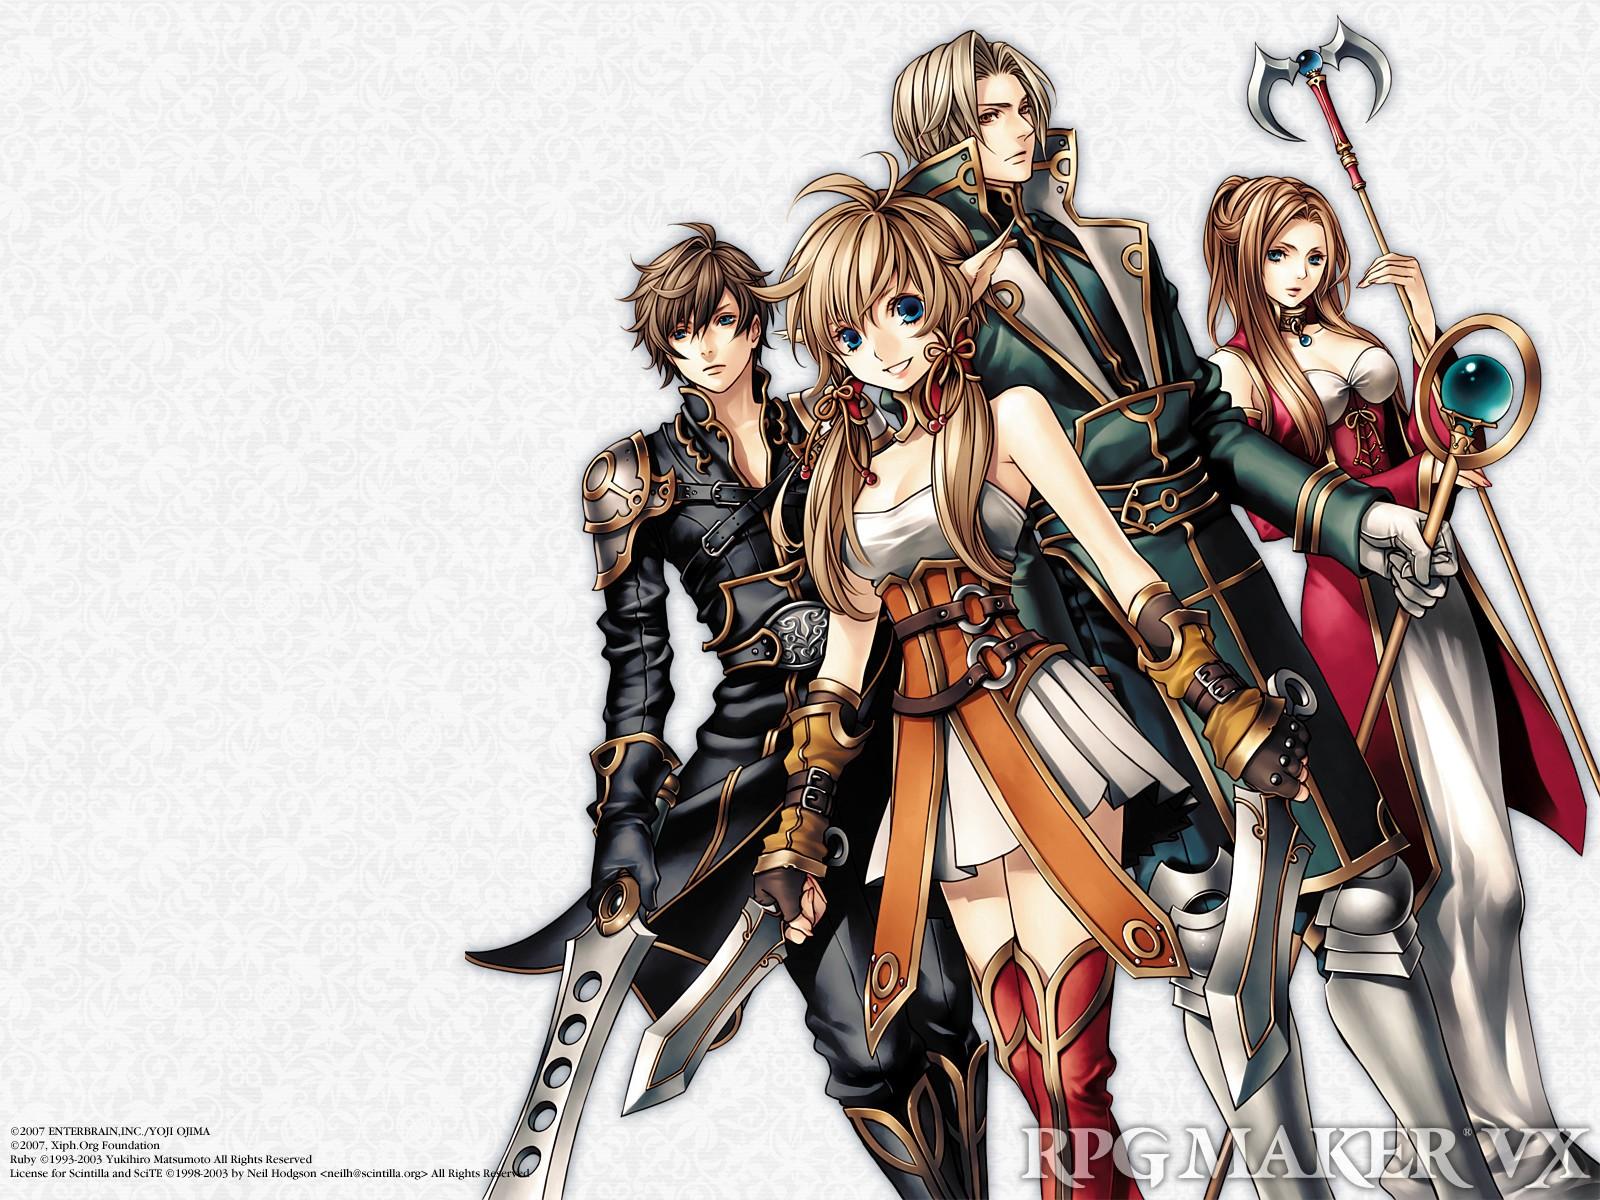 Wallpaper : anime, comics, Person, RPG Maker, sketch